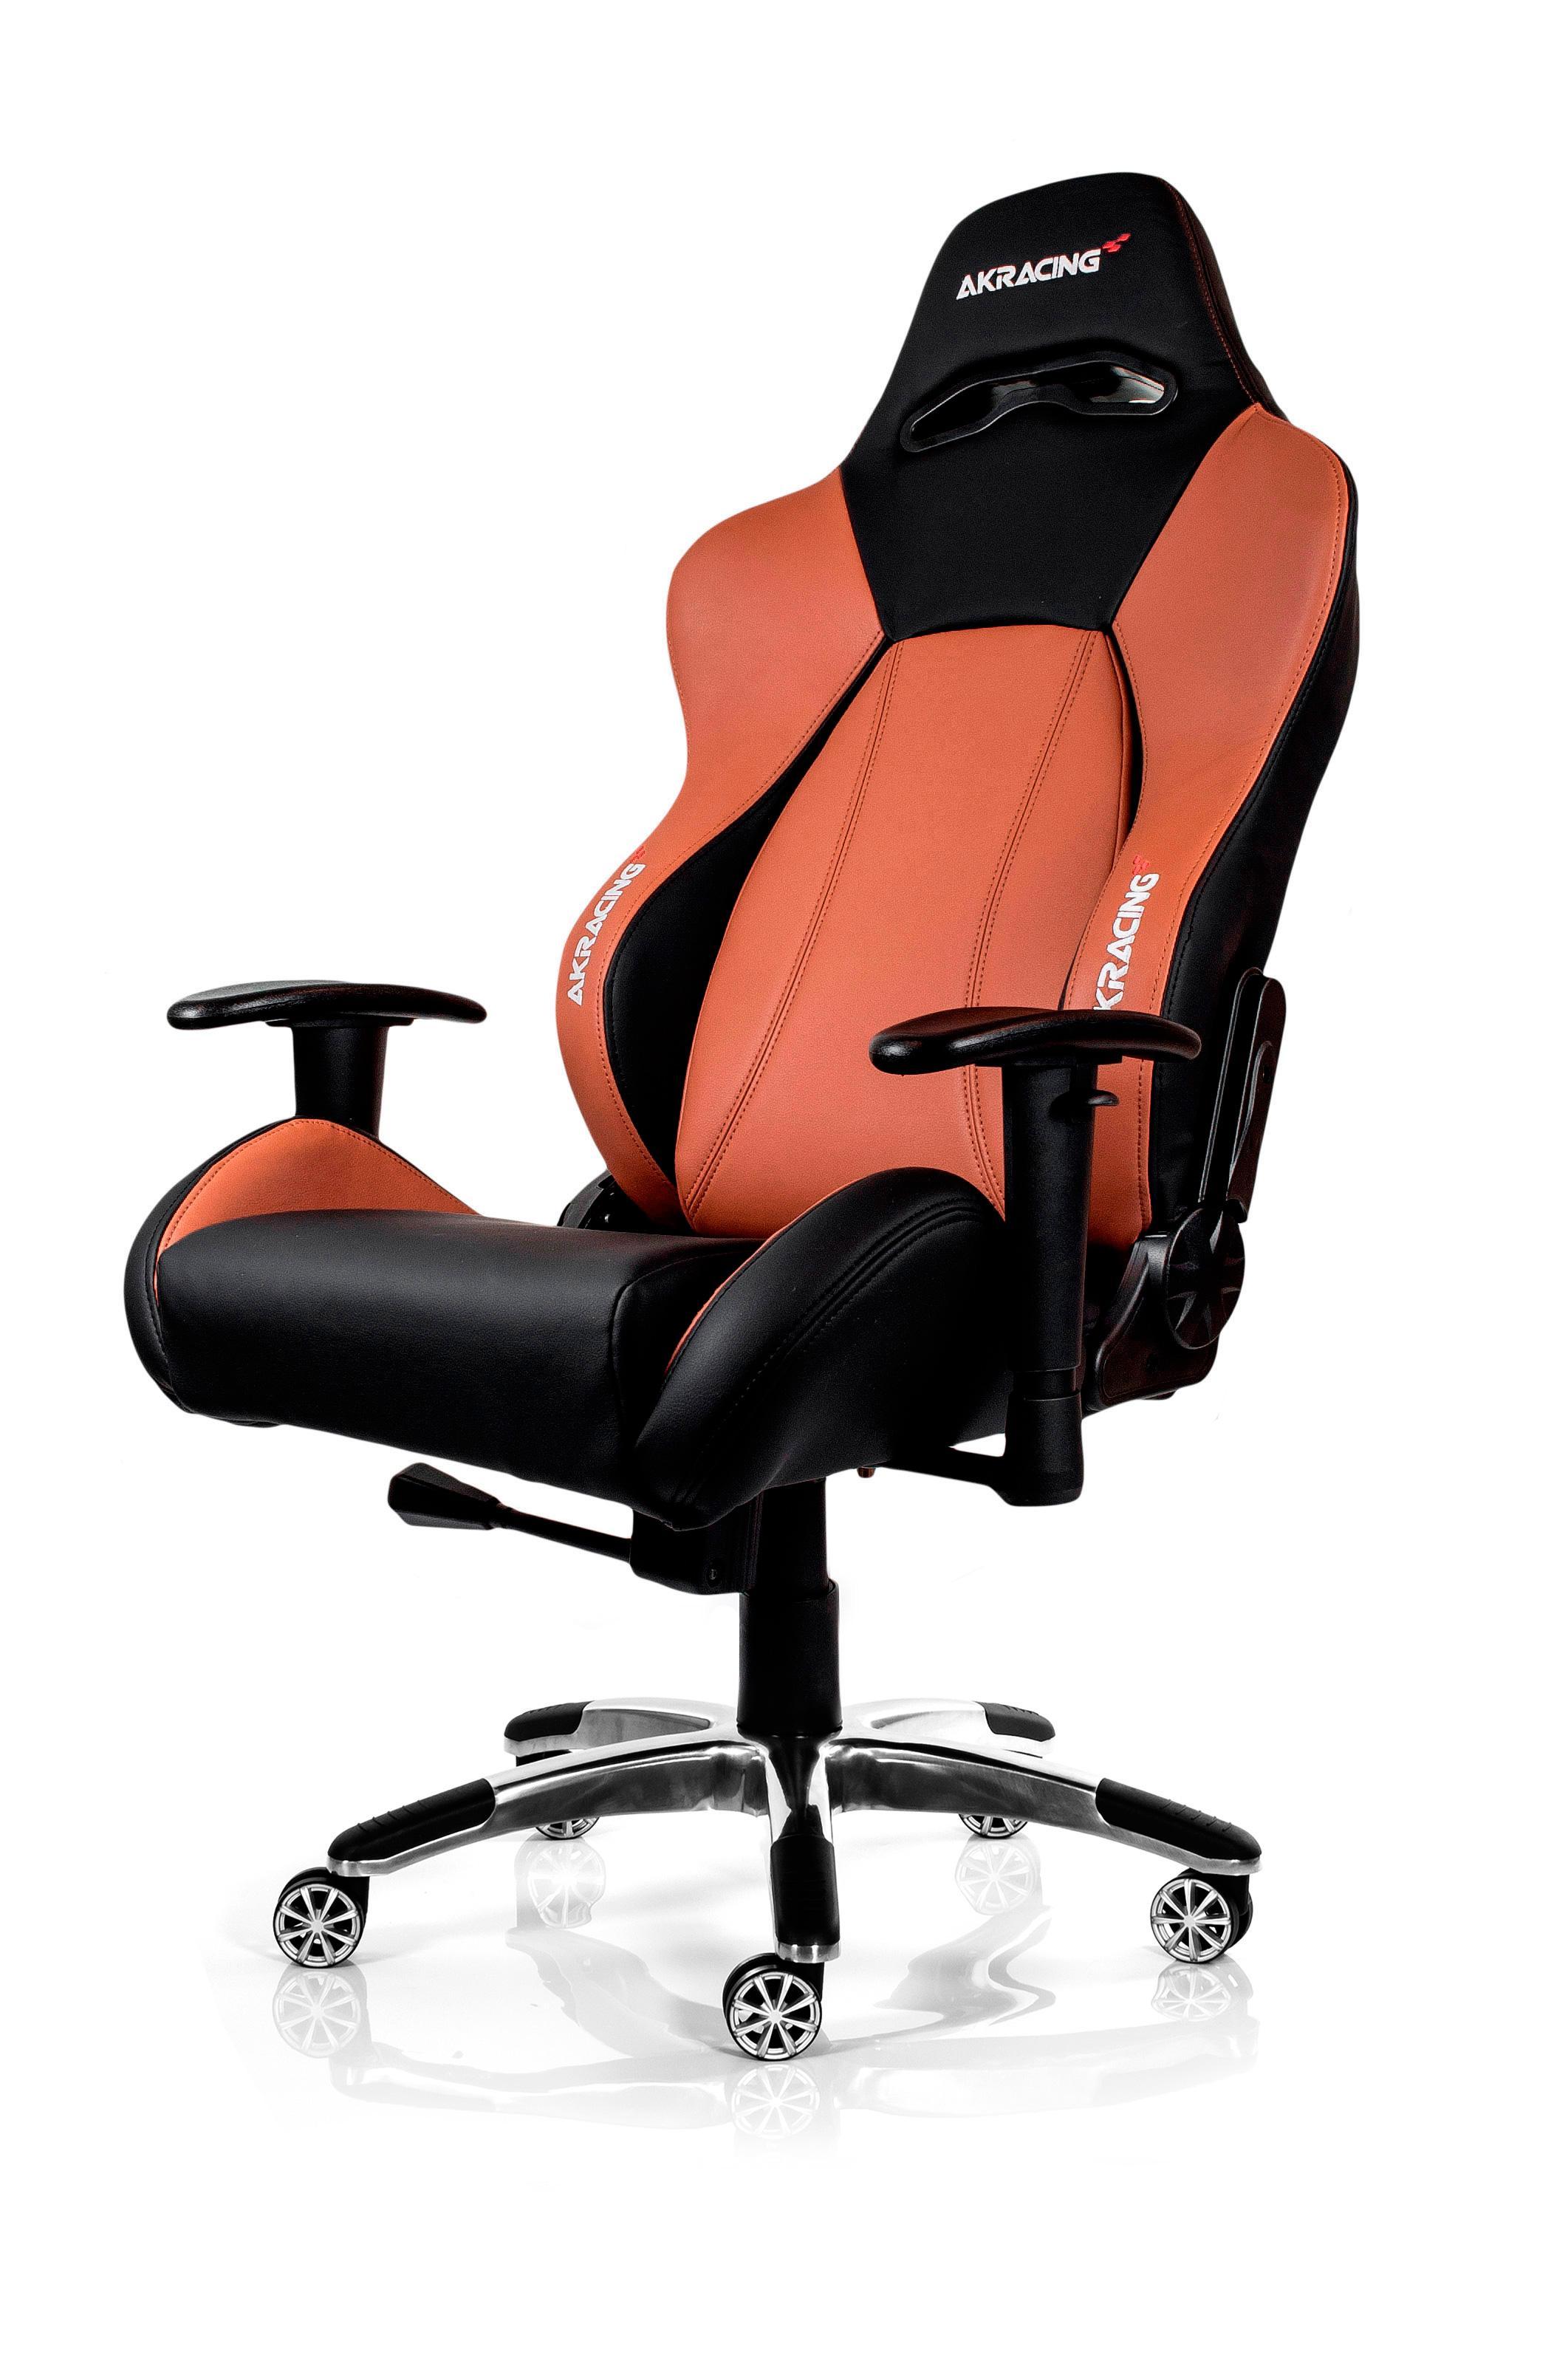 ak racing gaming premium gaming chair black brown